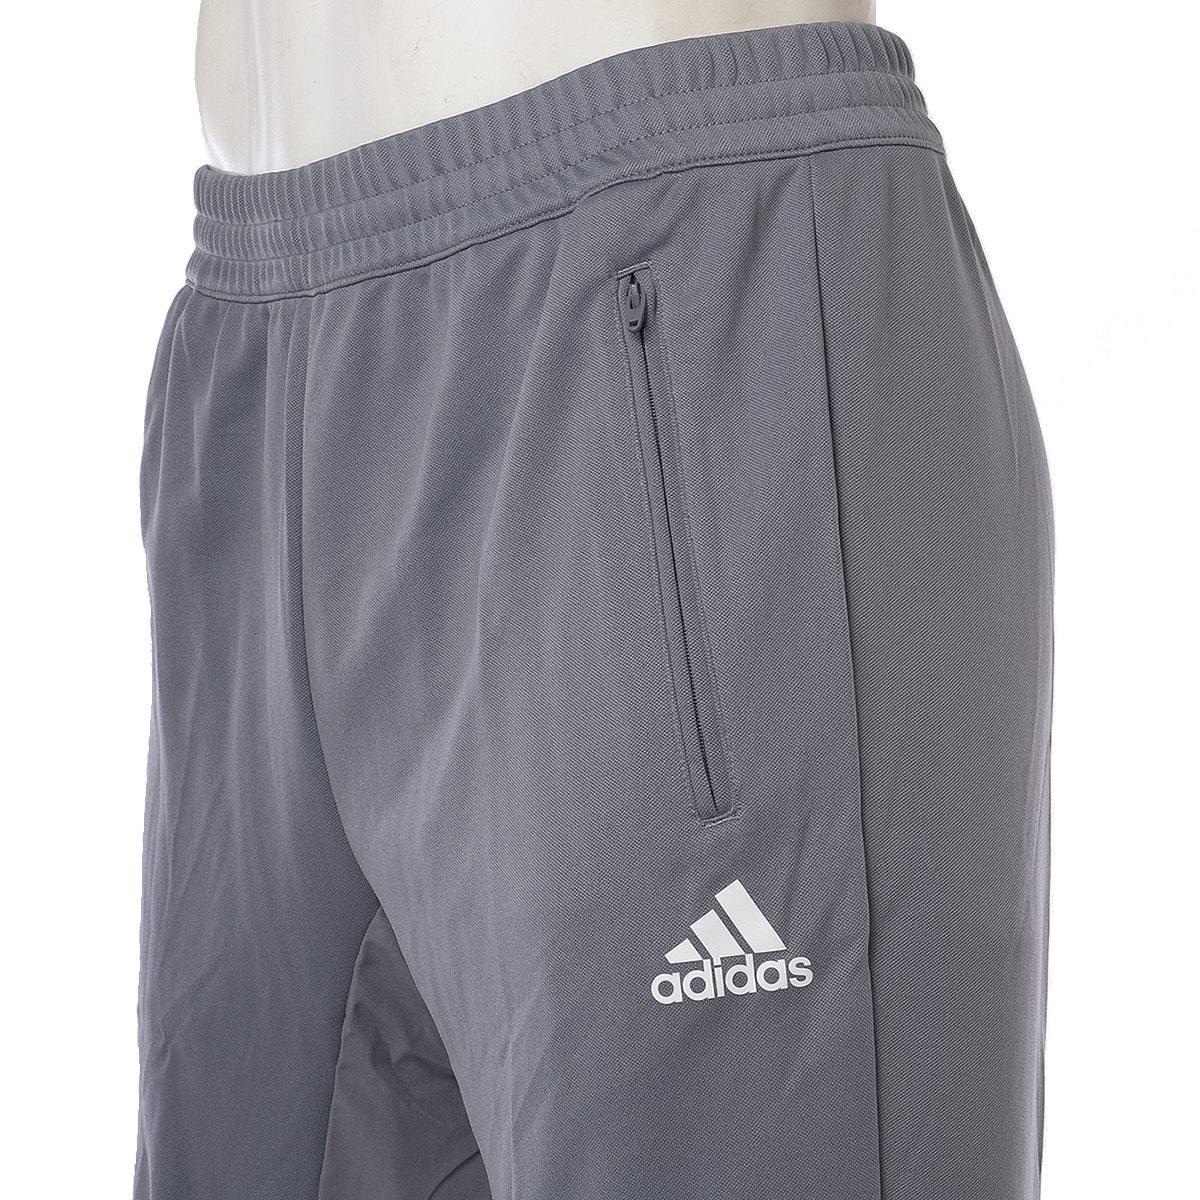 00 Future Oficial Adidas Tango Tienda 1 Grey Pantalon 190 18wzSpxq55